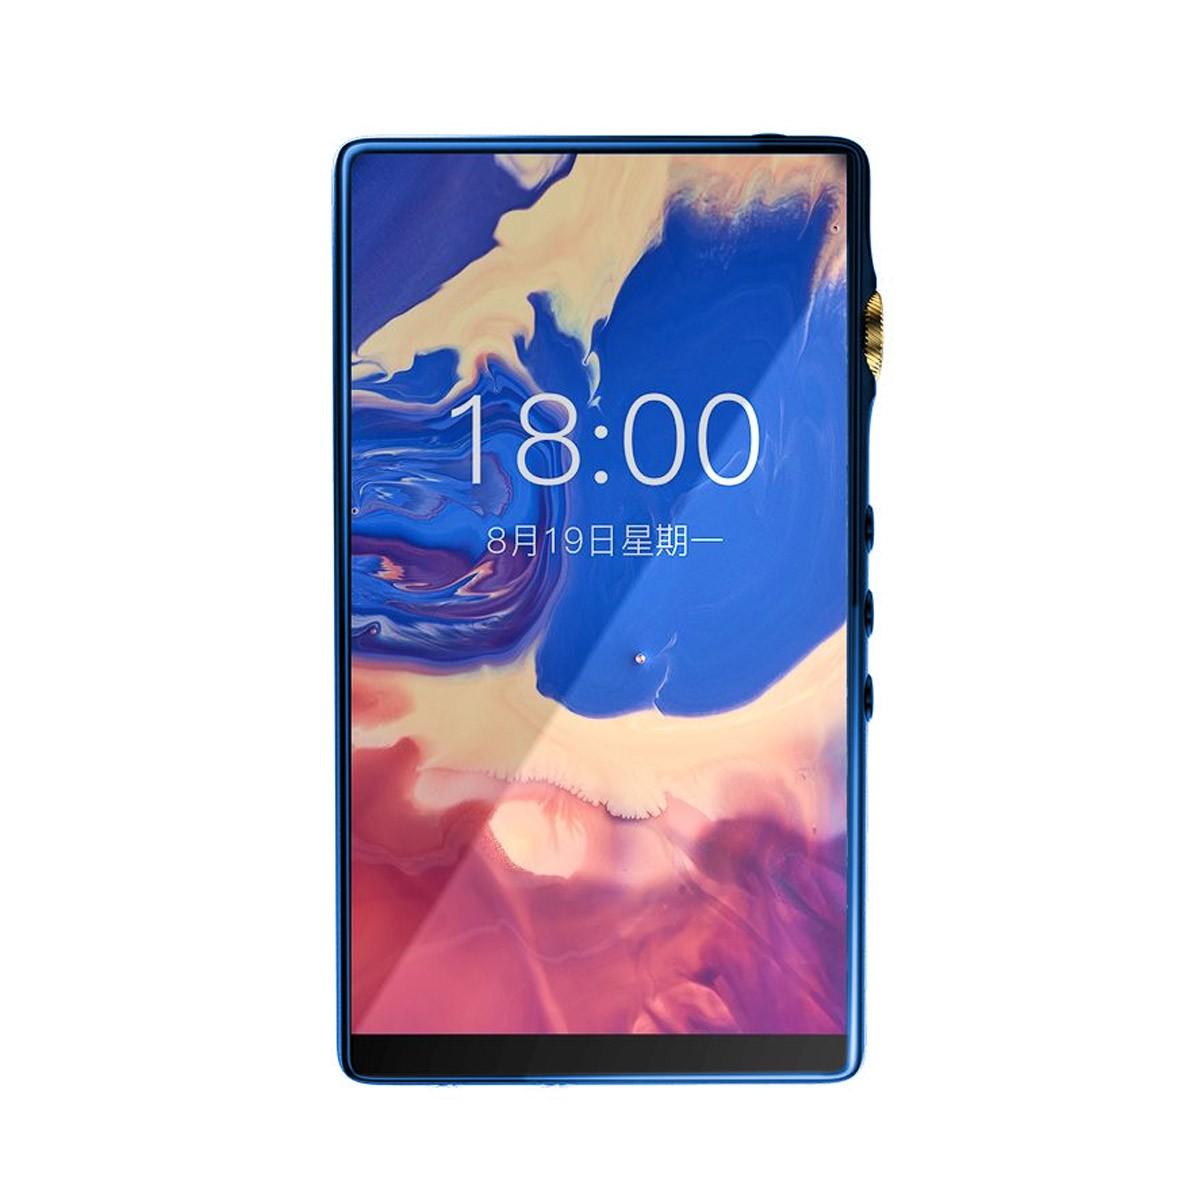 IBASSO DX160 Baladeur Numérique HiFi 2x CS43198 Bluetooth 5.0 32bit 384kHz DSD Bleu